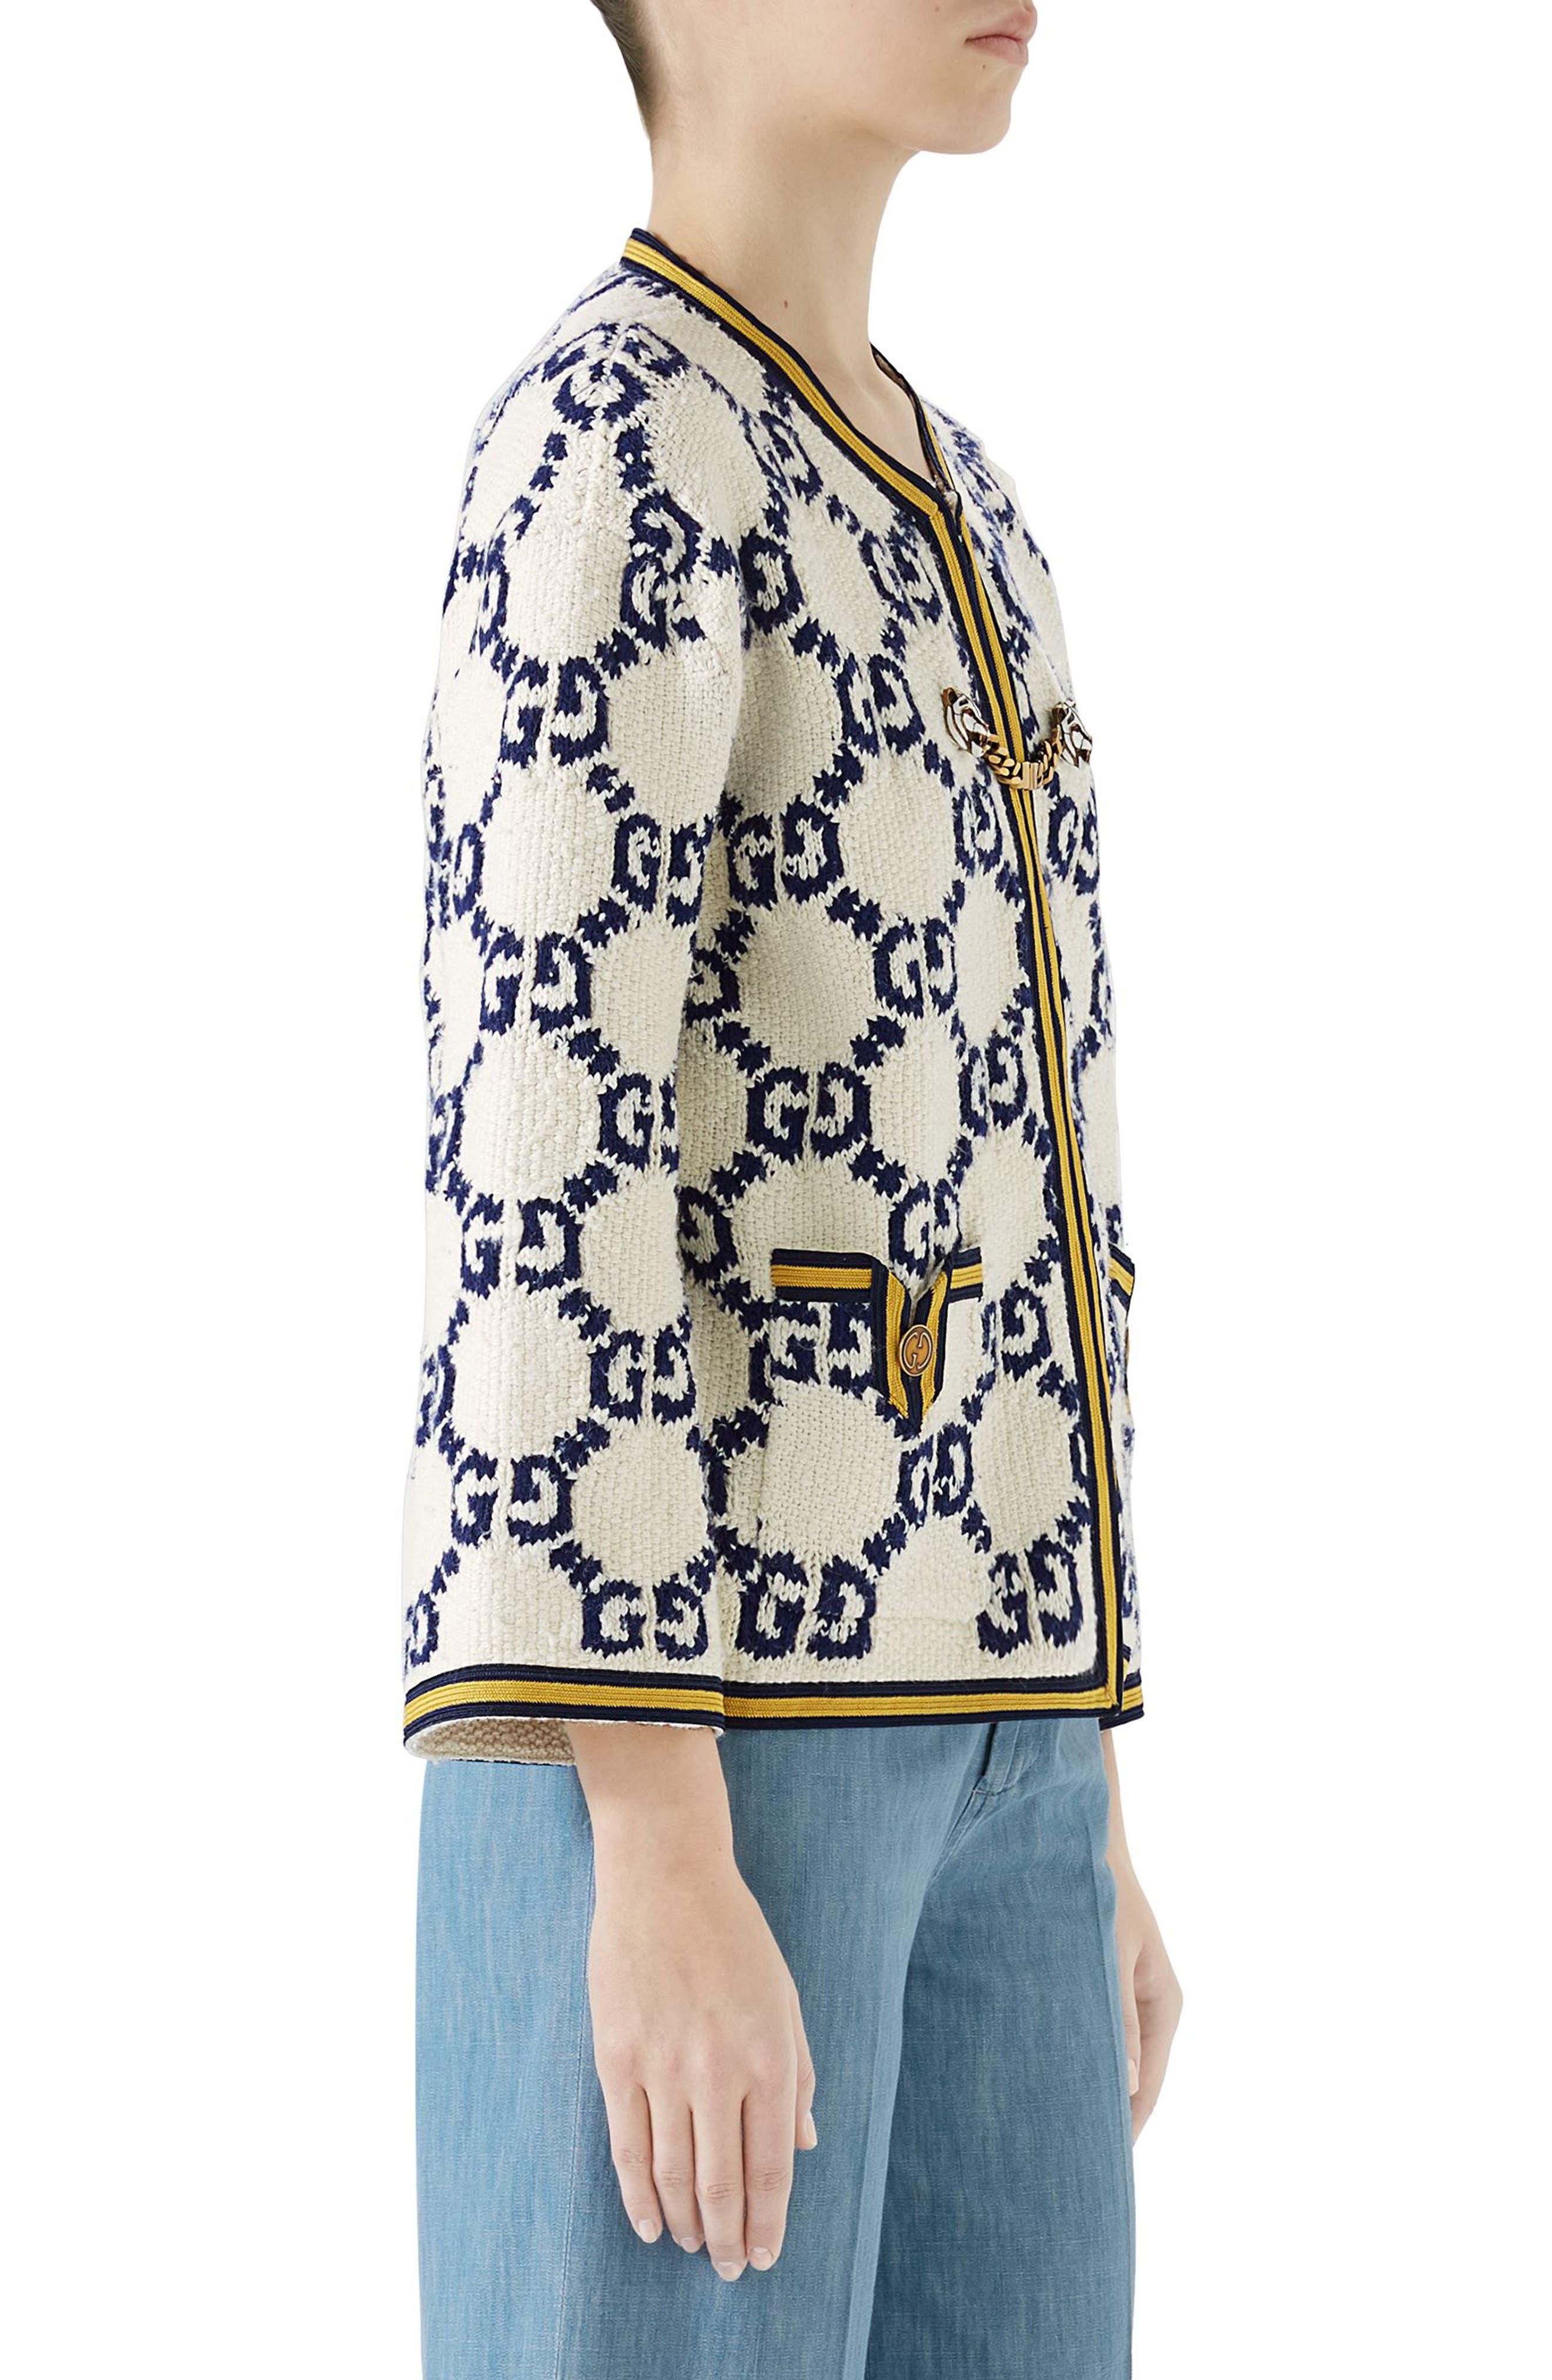 GG Textured Silk, Wool & Linen Tweed Jacket,                             Alternate thumbnail 3, color,                             MULTI